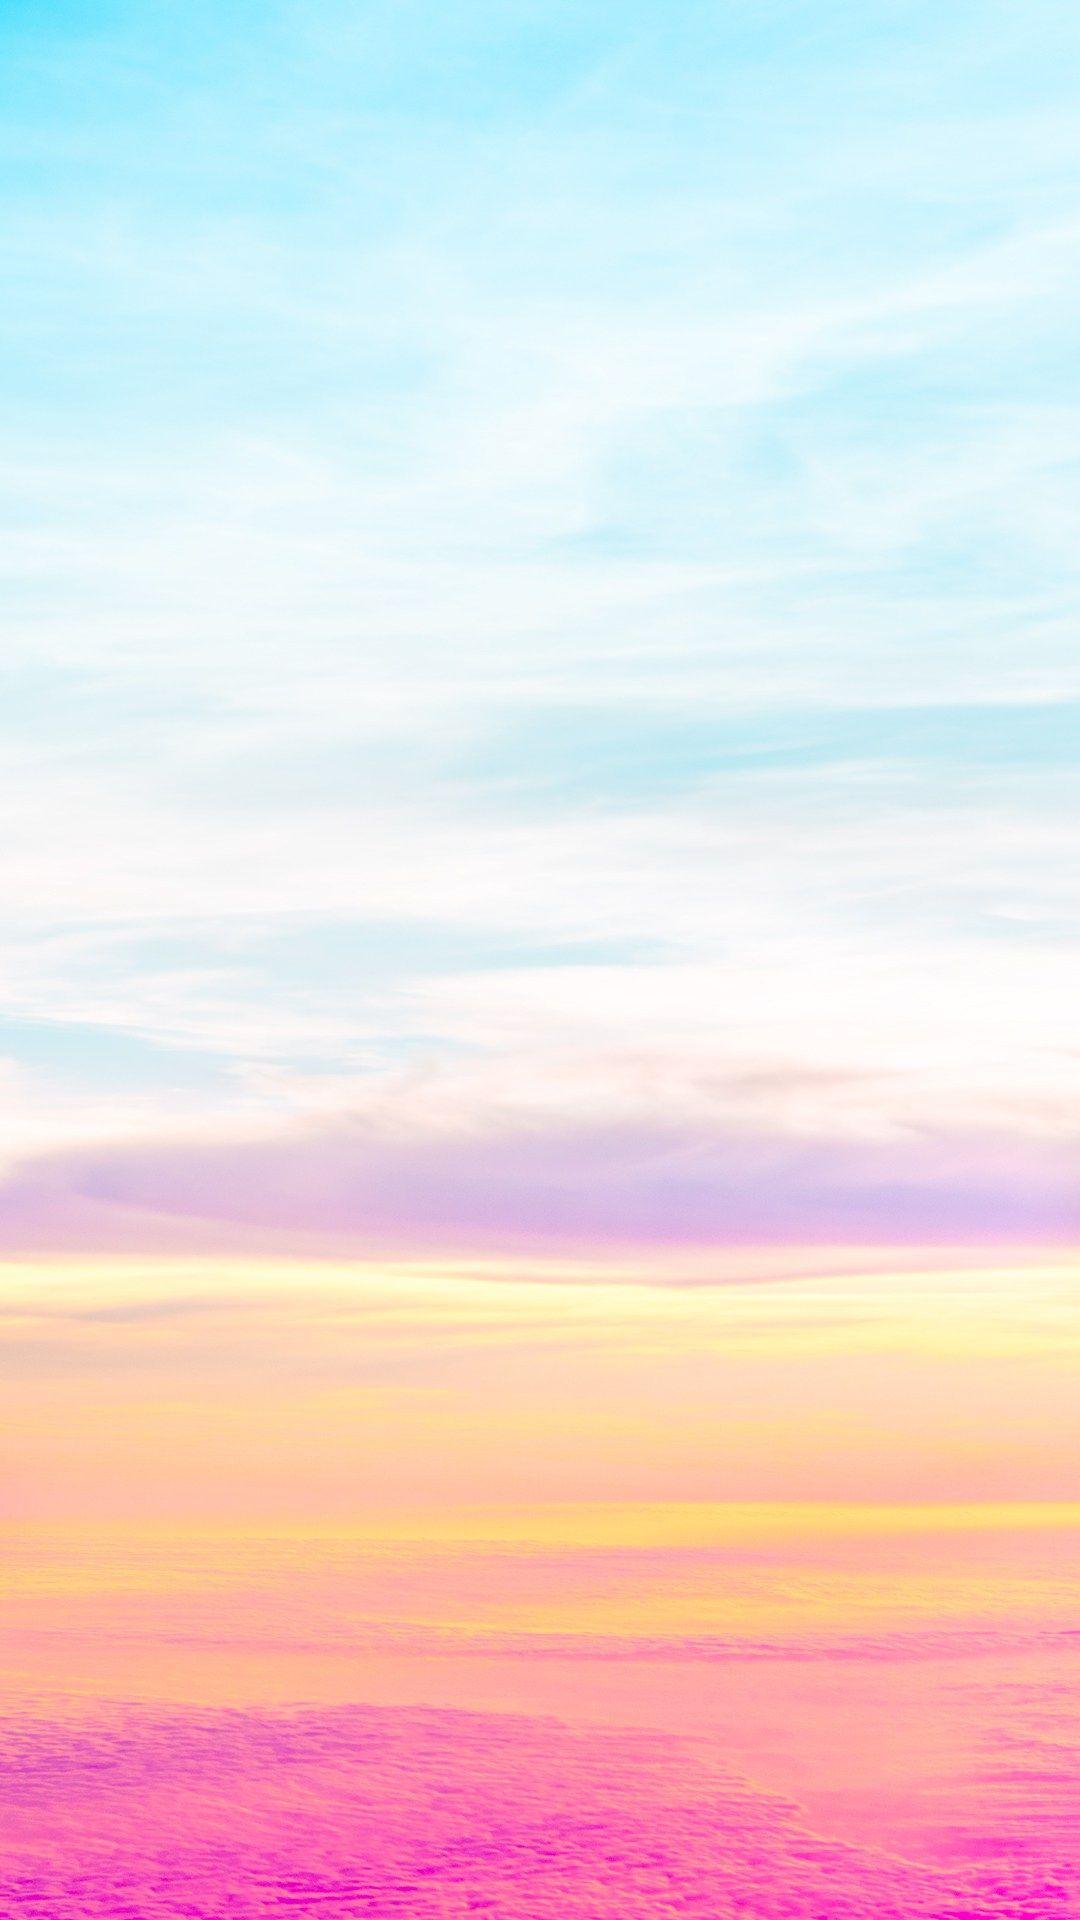 Beautiful Pastel Sky Iphone 6 Hd Wallpaper Pastel Iphone